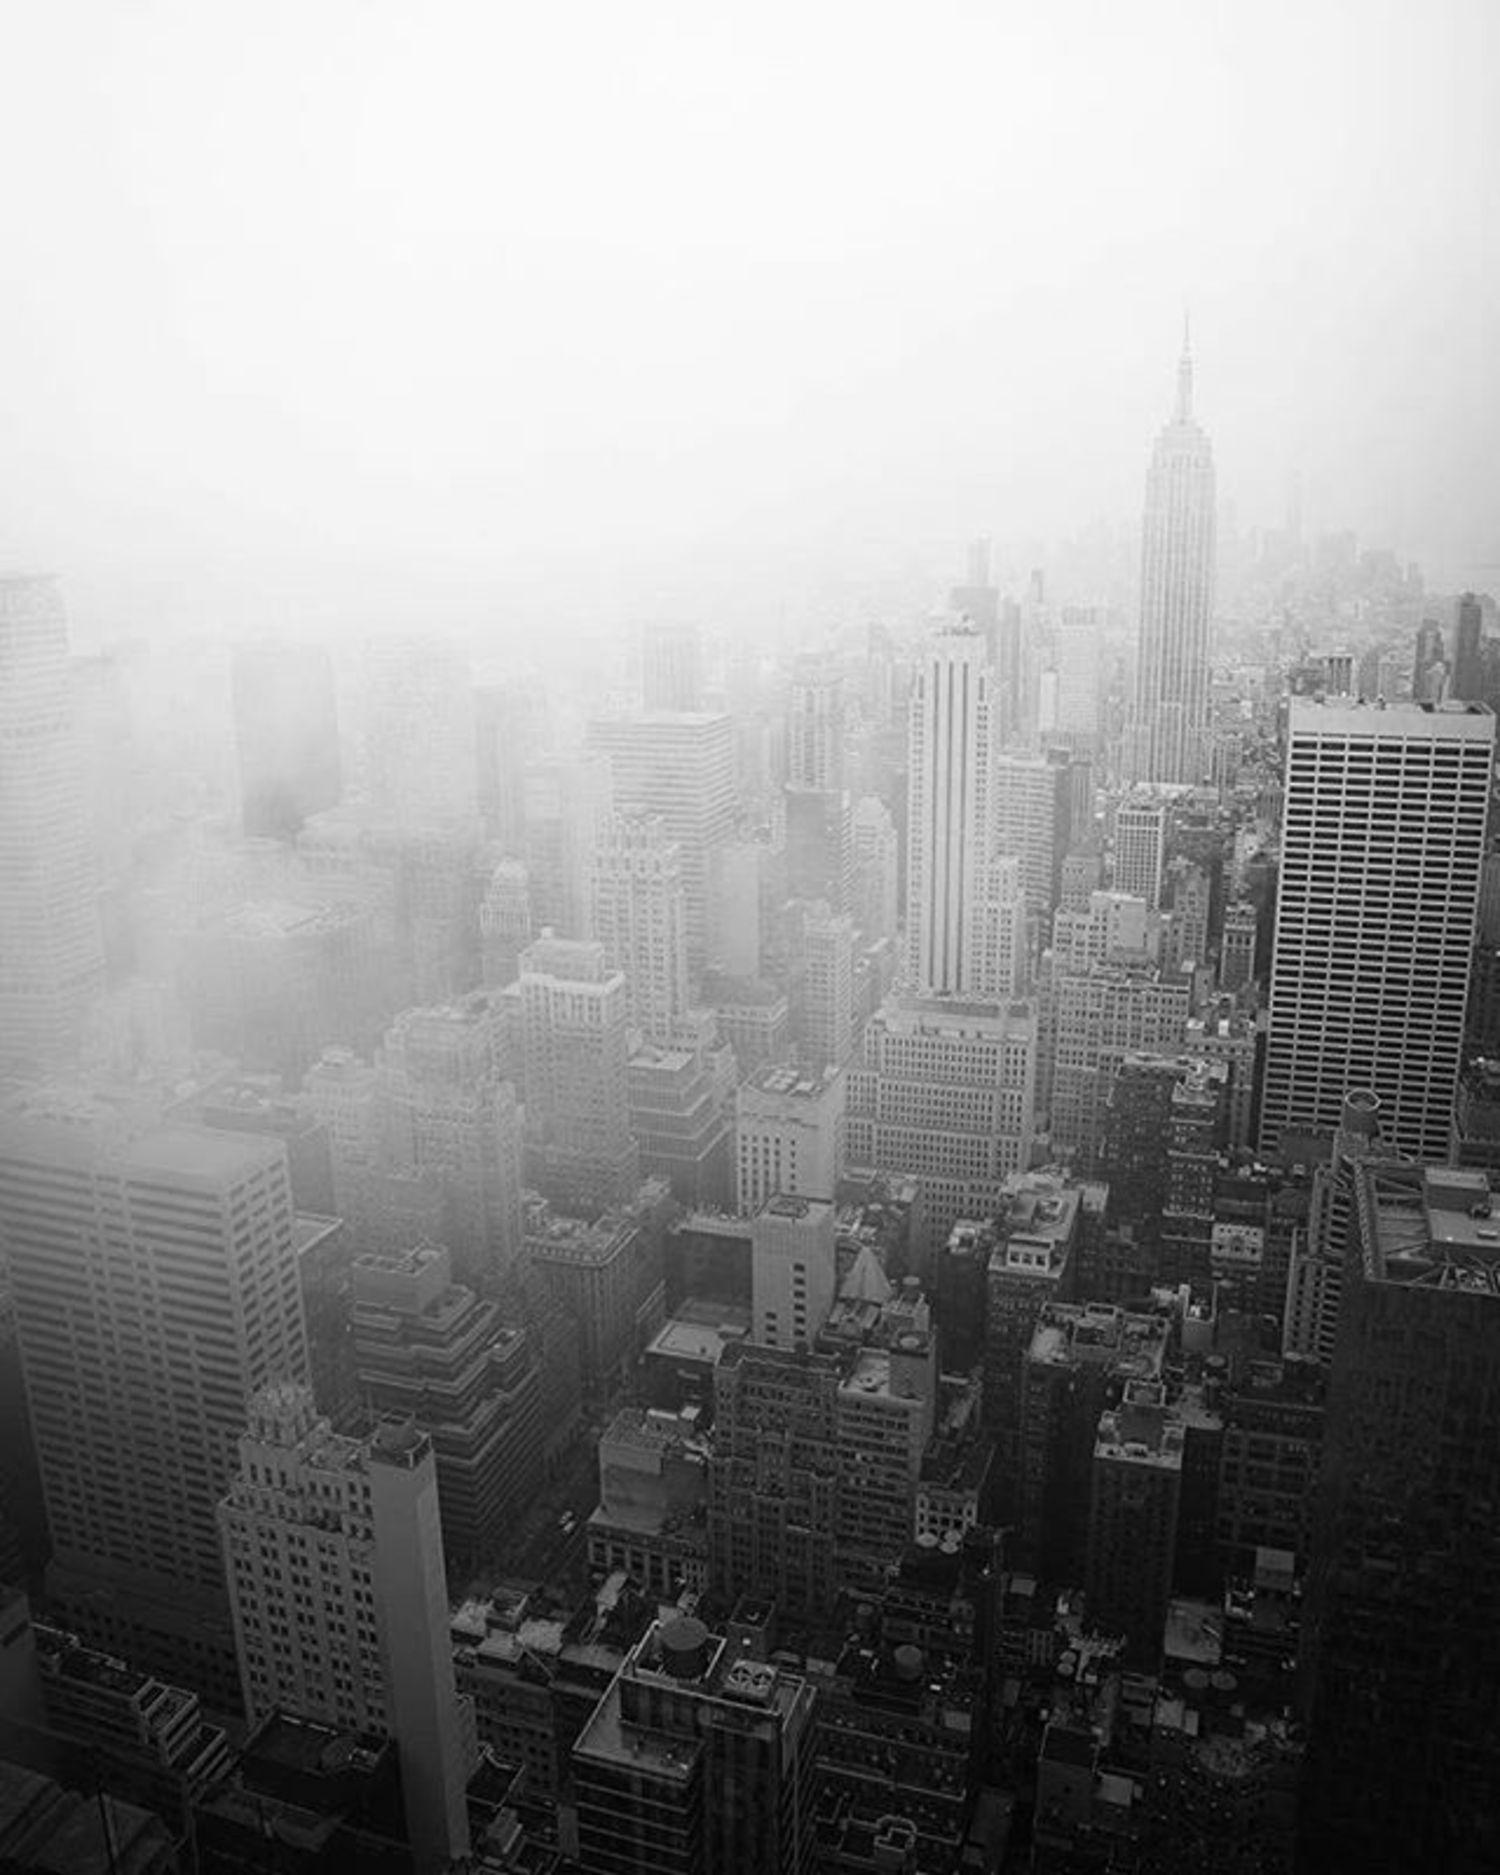 New York, New York. Photo via @raylivez #viewingnyc #newyork #newyorkcity